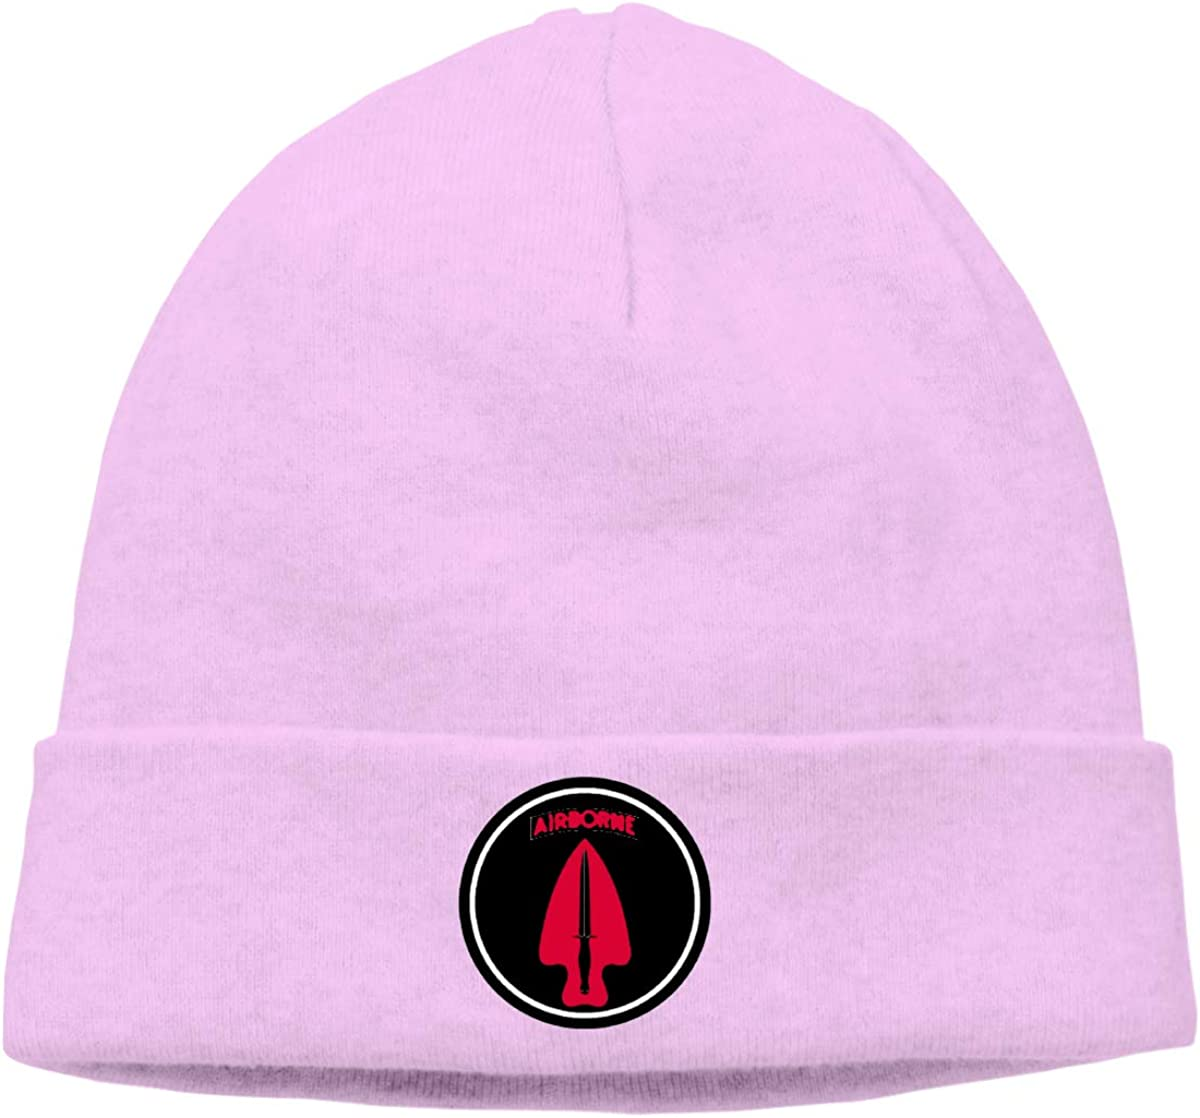 WWGSFSDHTTM Alzheimers Awareness Warm Hat Baggy Slouchy Beanie Hat Skull Cap